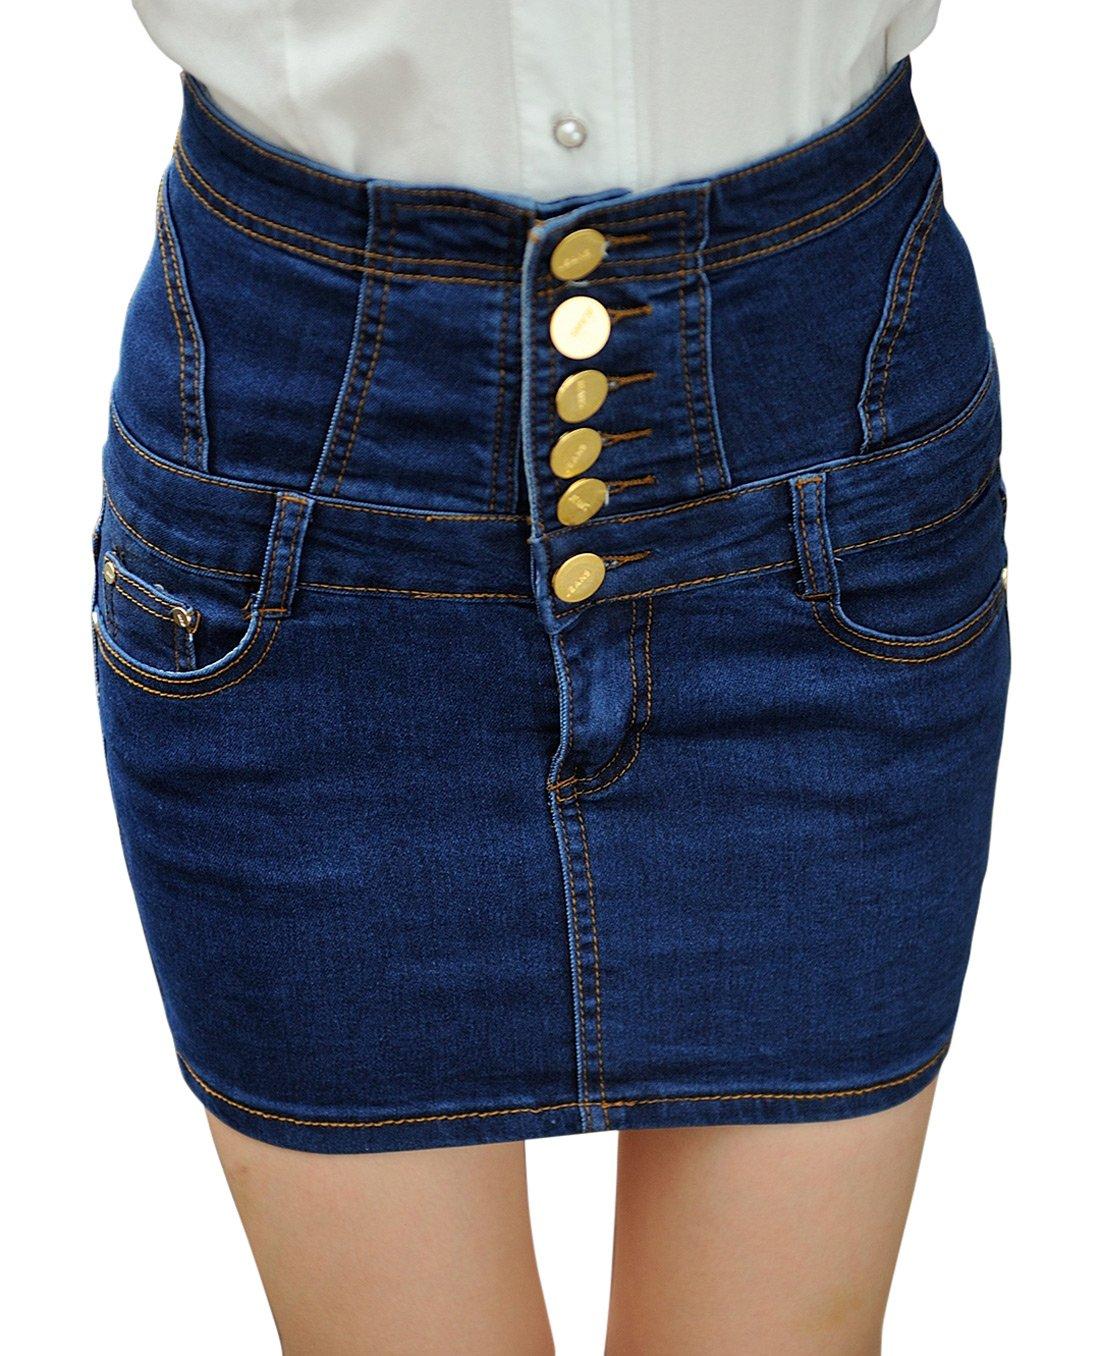 Chouyatou Women's Casual Short Denim Skirt (Medium, H76-Blue)